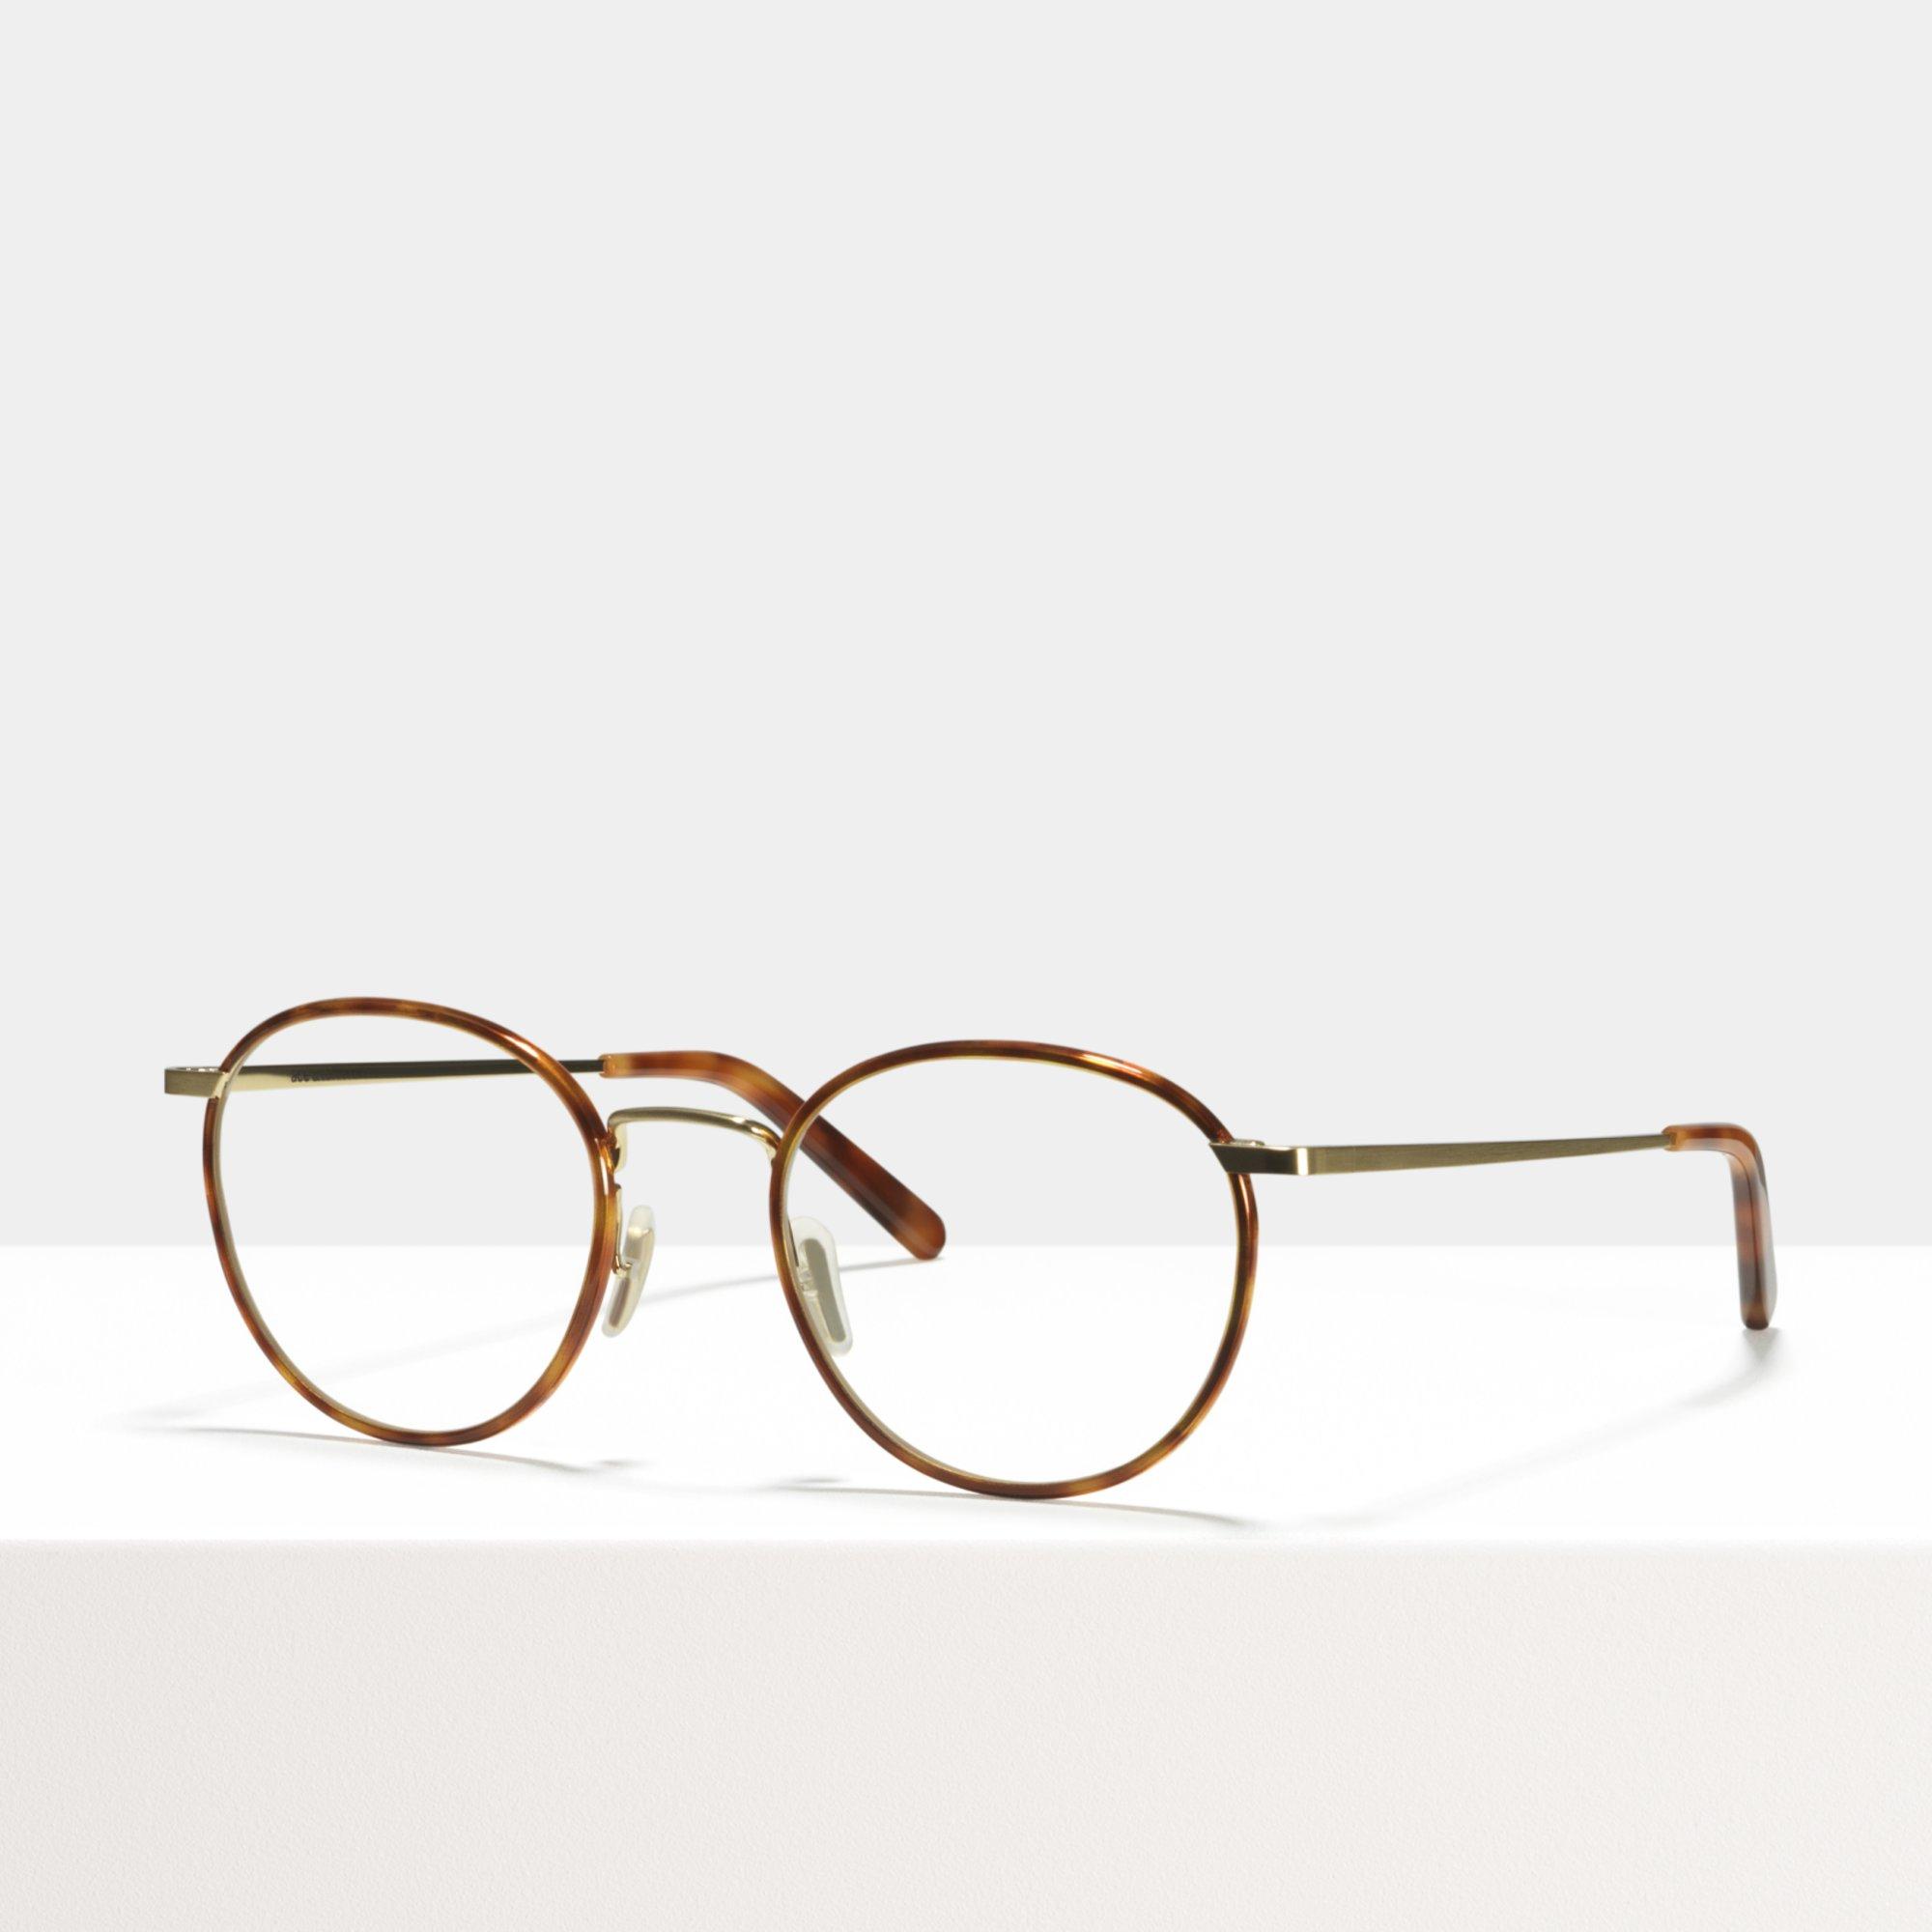 Ace & Tate Glasses | round metal in Brown, Gold, Orange